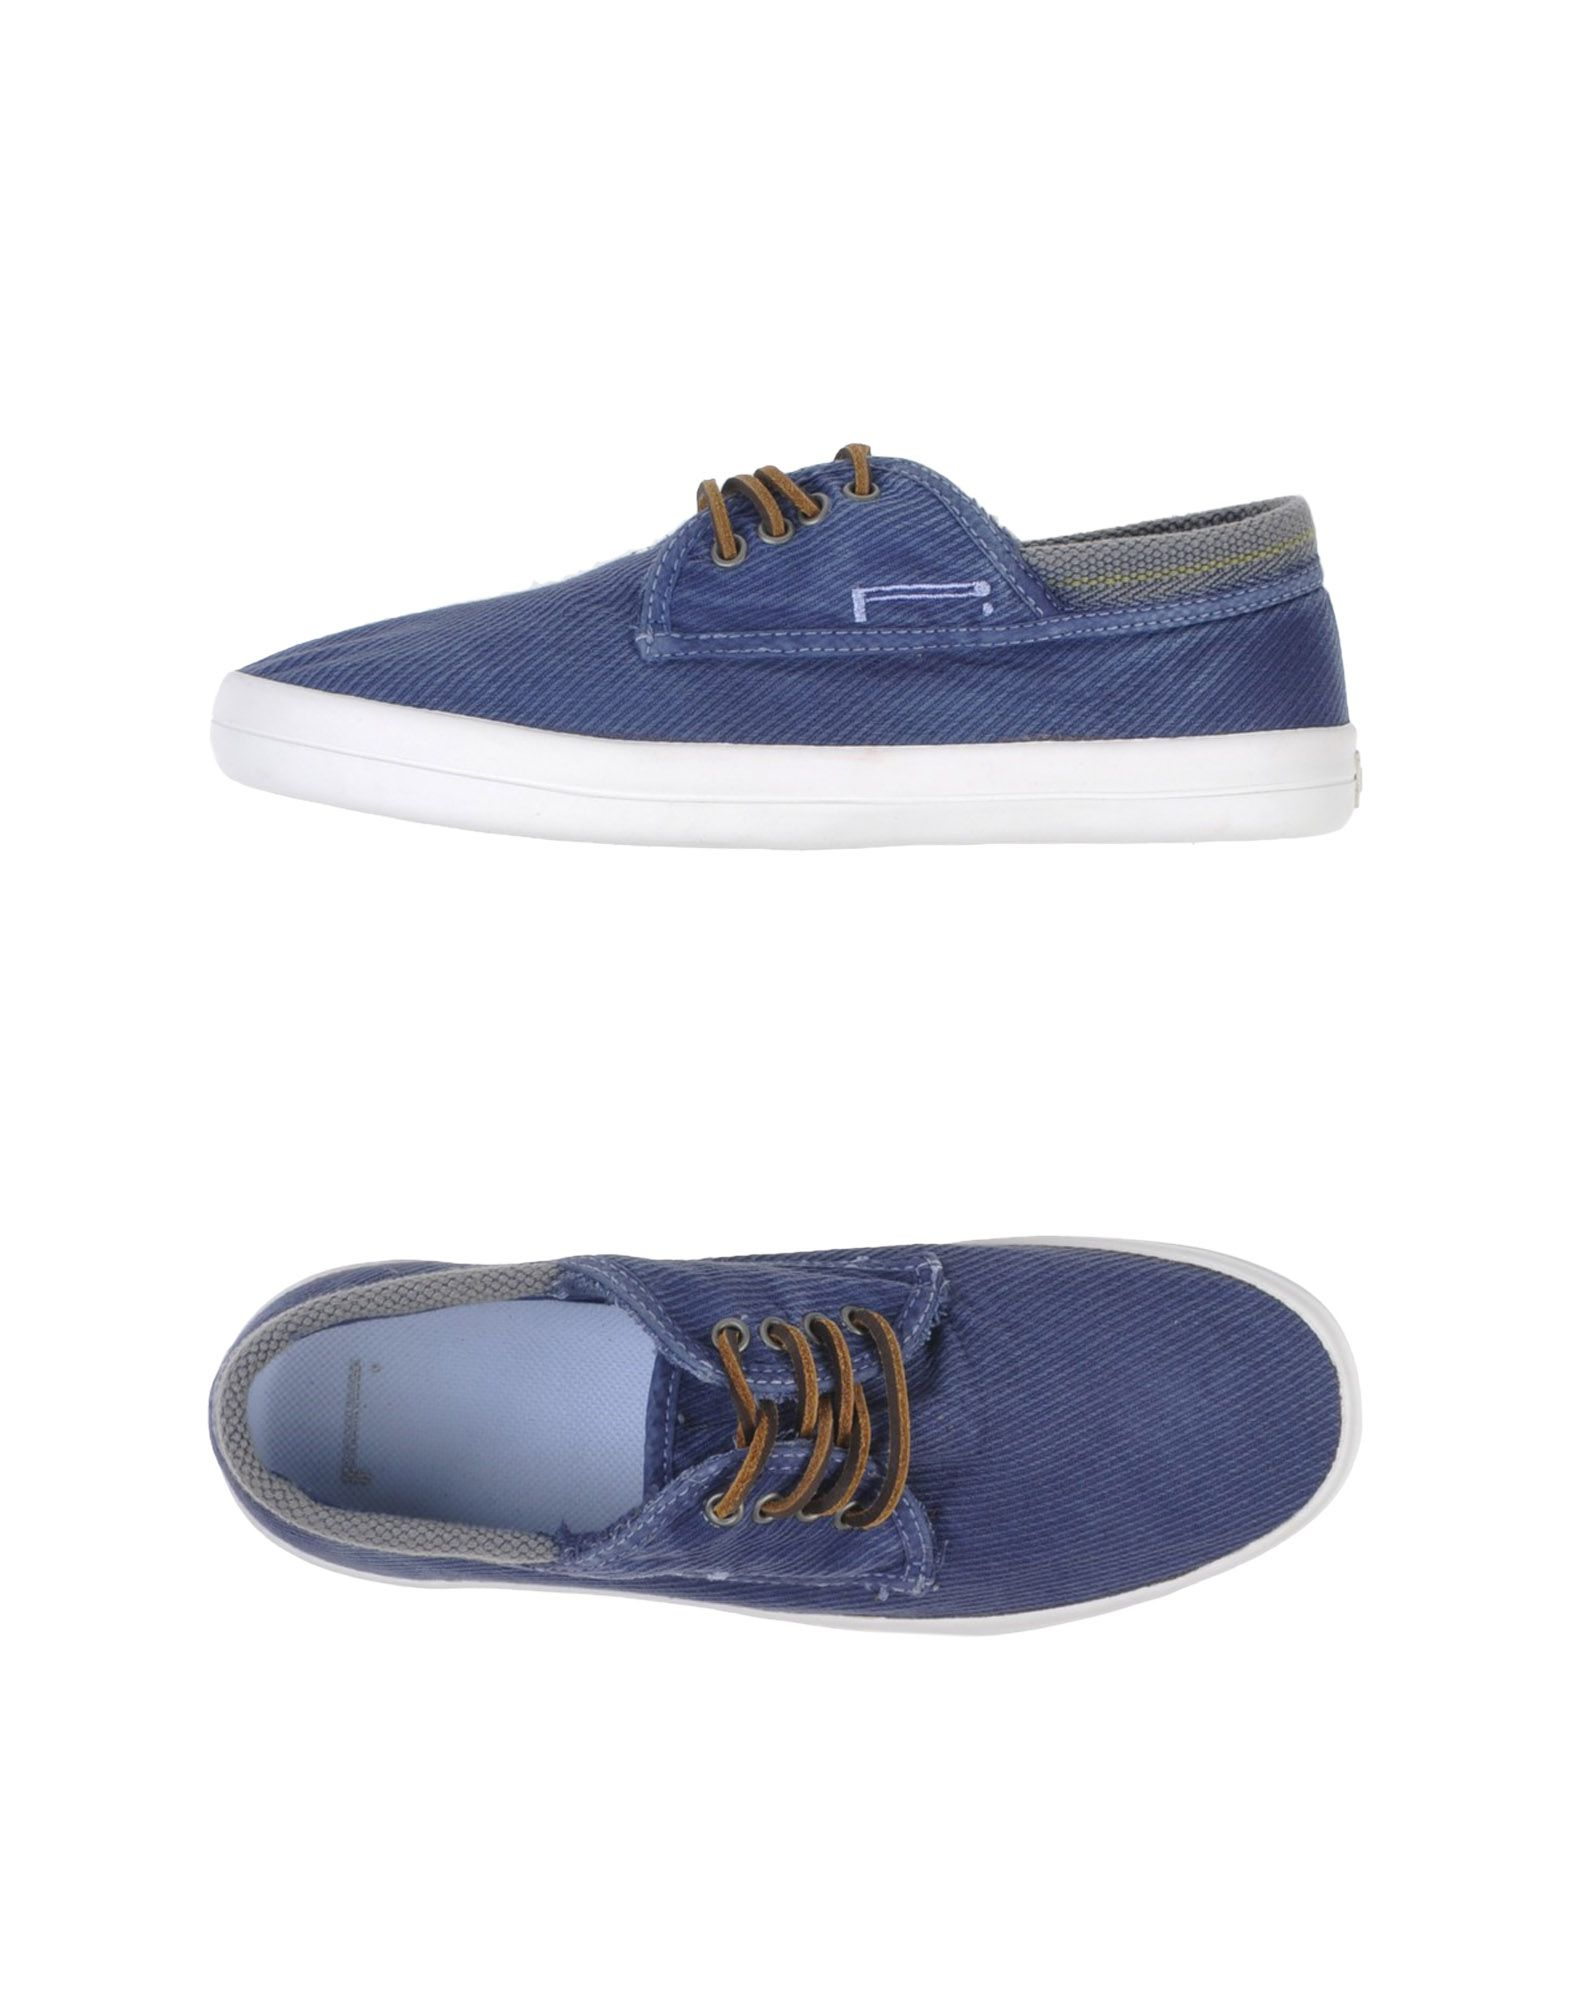 pirelli pzero low tops trainers in blue for